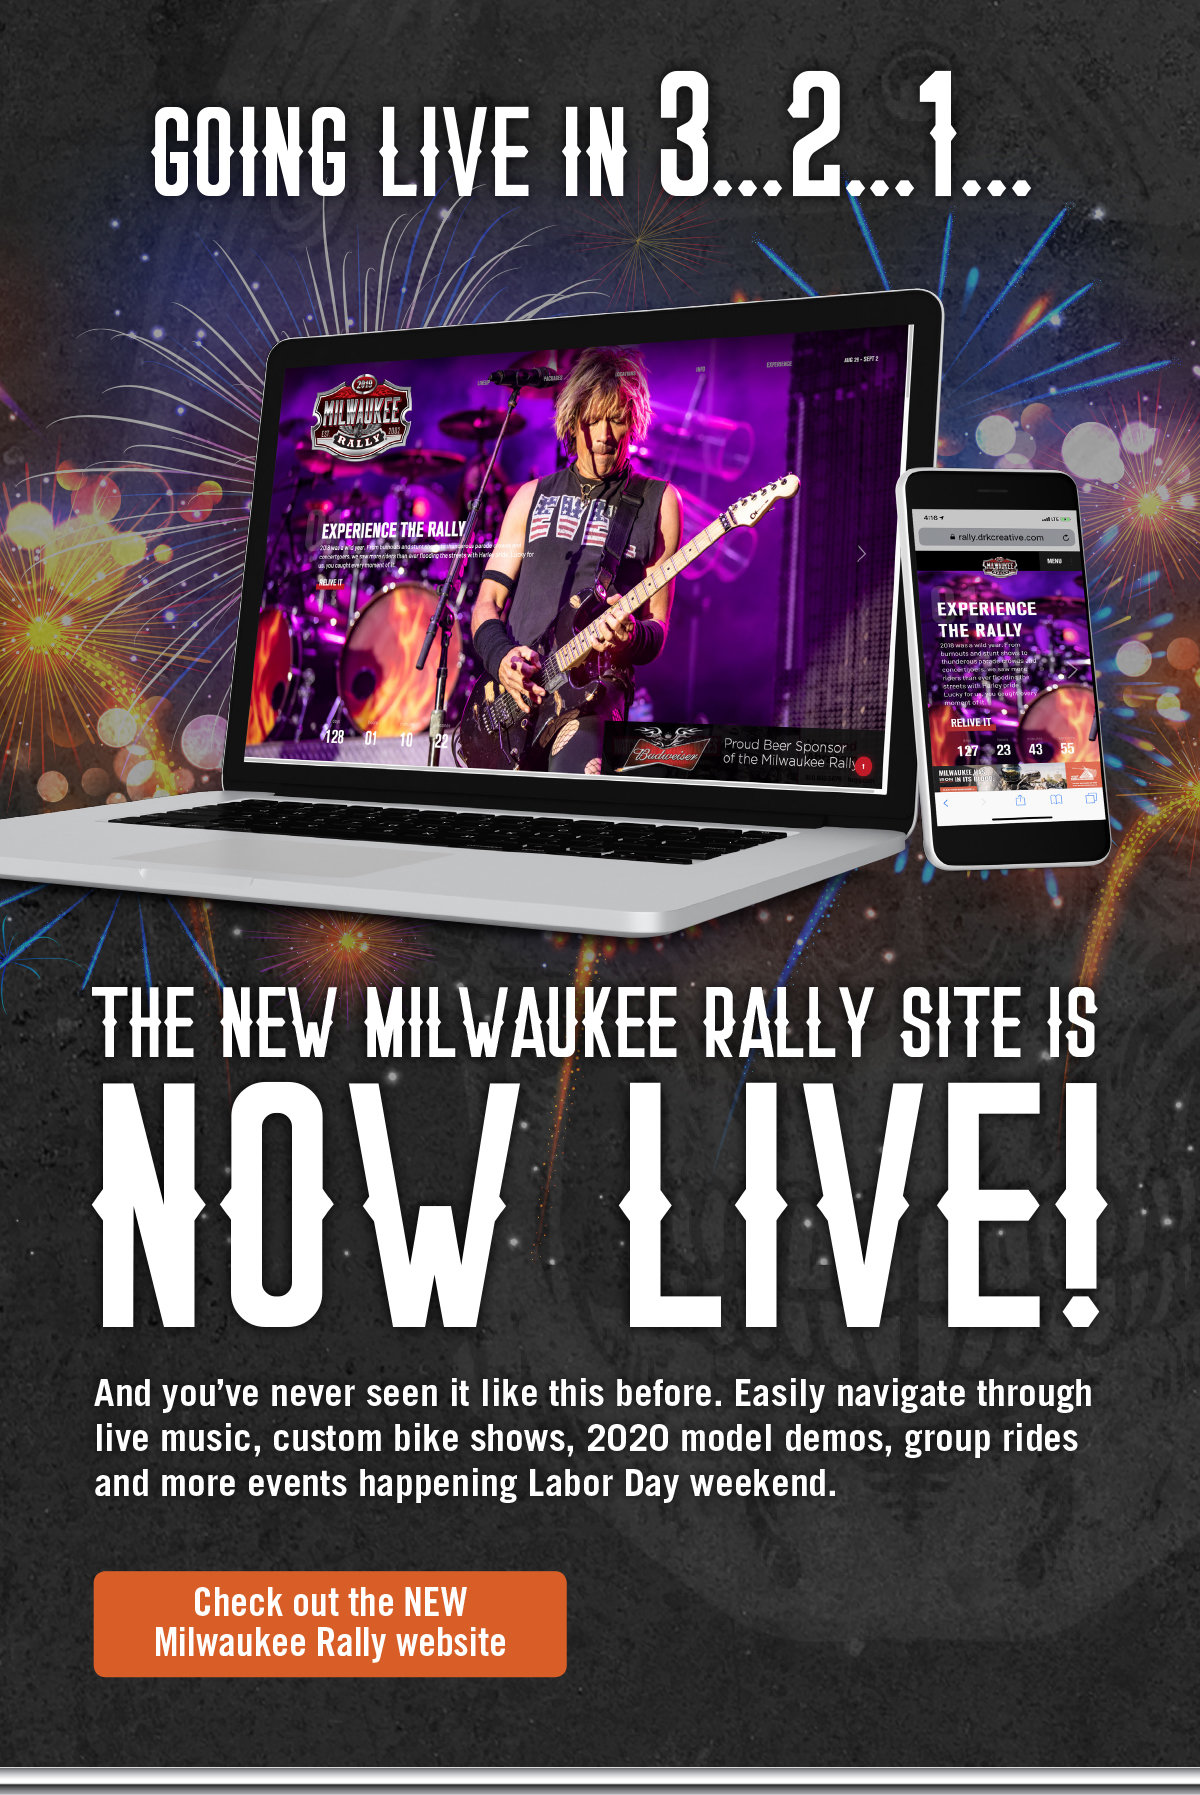 Milwaukee rally website launch ad